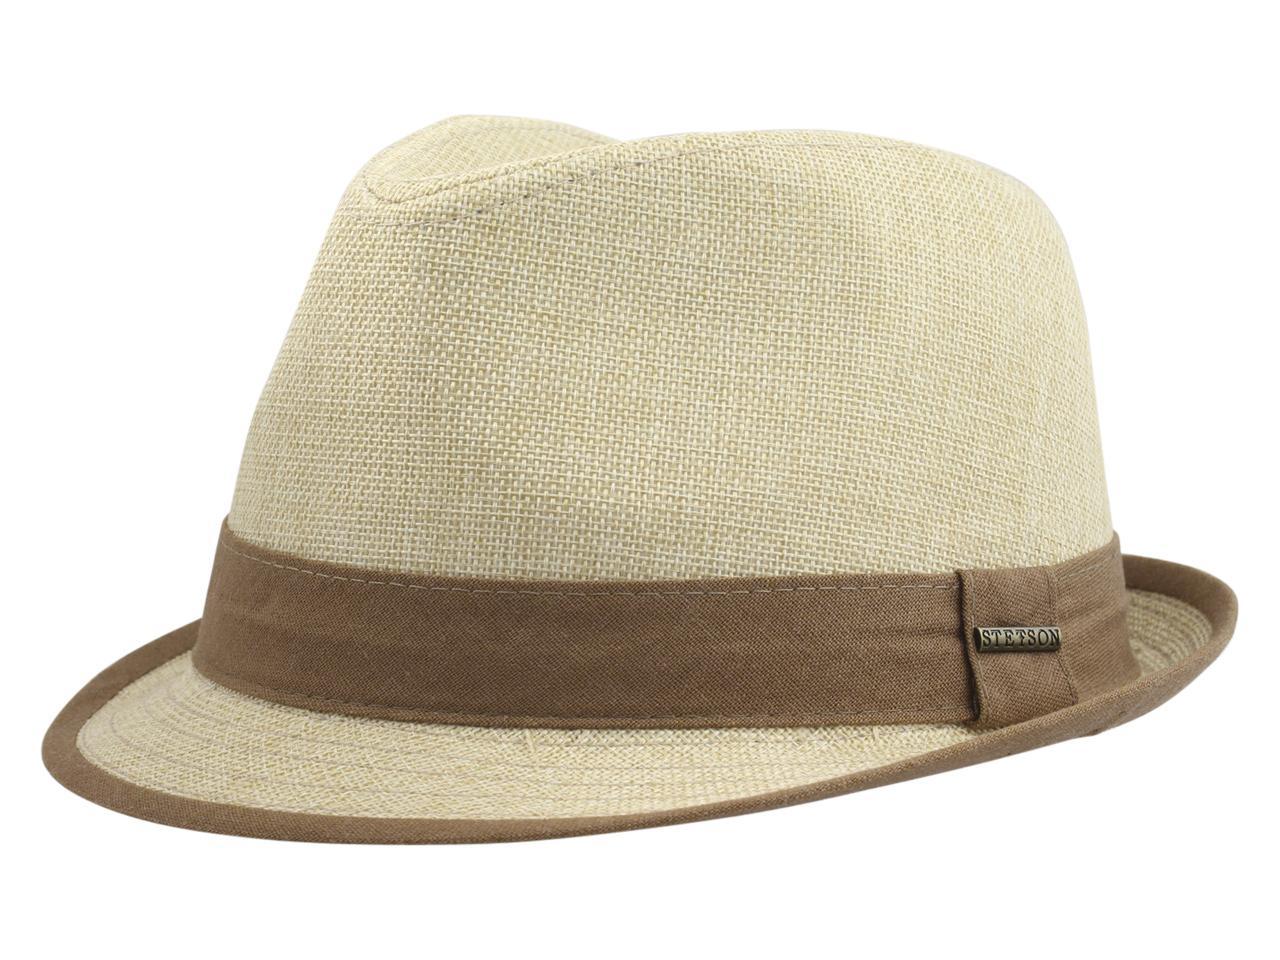 Image of Stetson Men's Contrast Trim Fedora Hat - Tea - Large